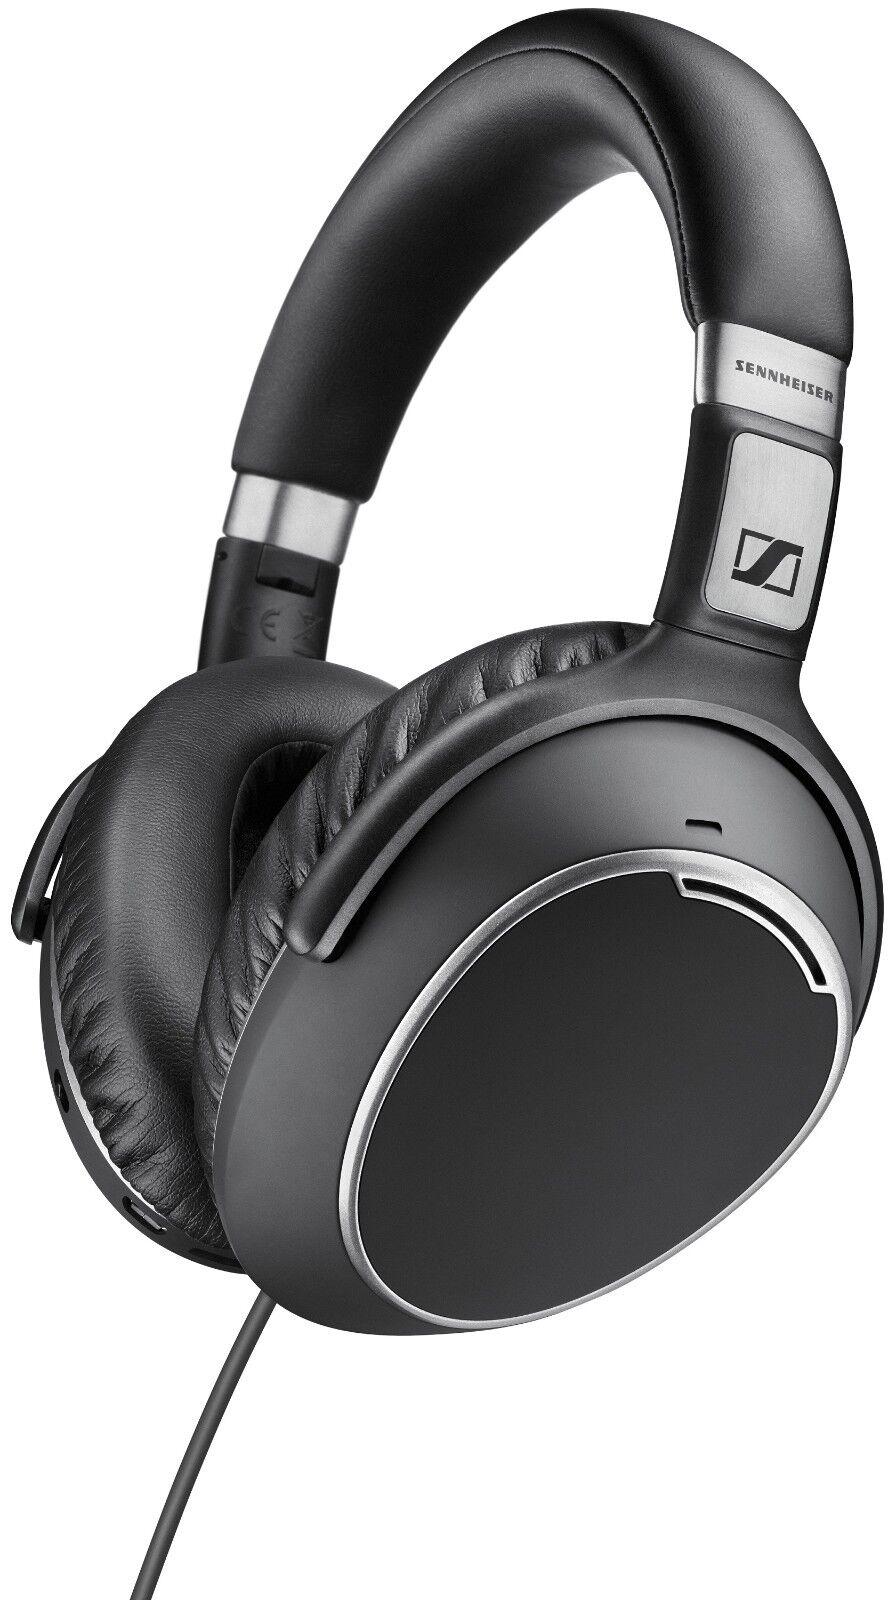 SENNHEISER PXC 480 Noise Cancelling Headphone with travel-